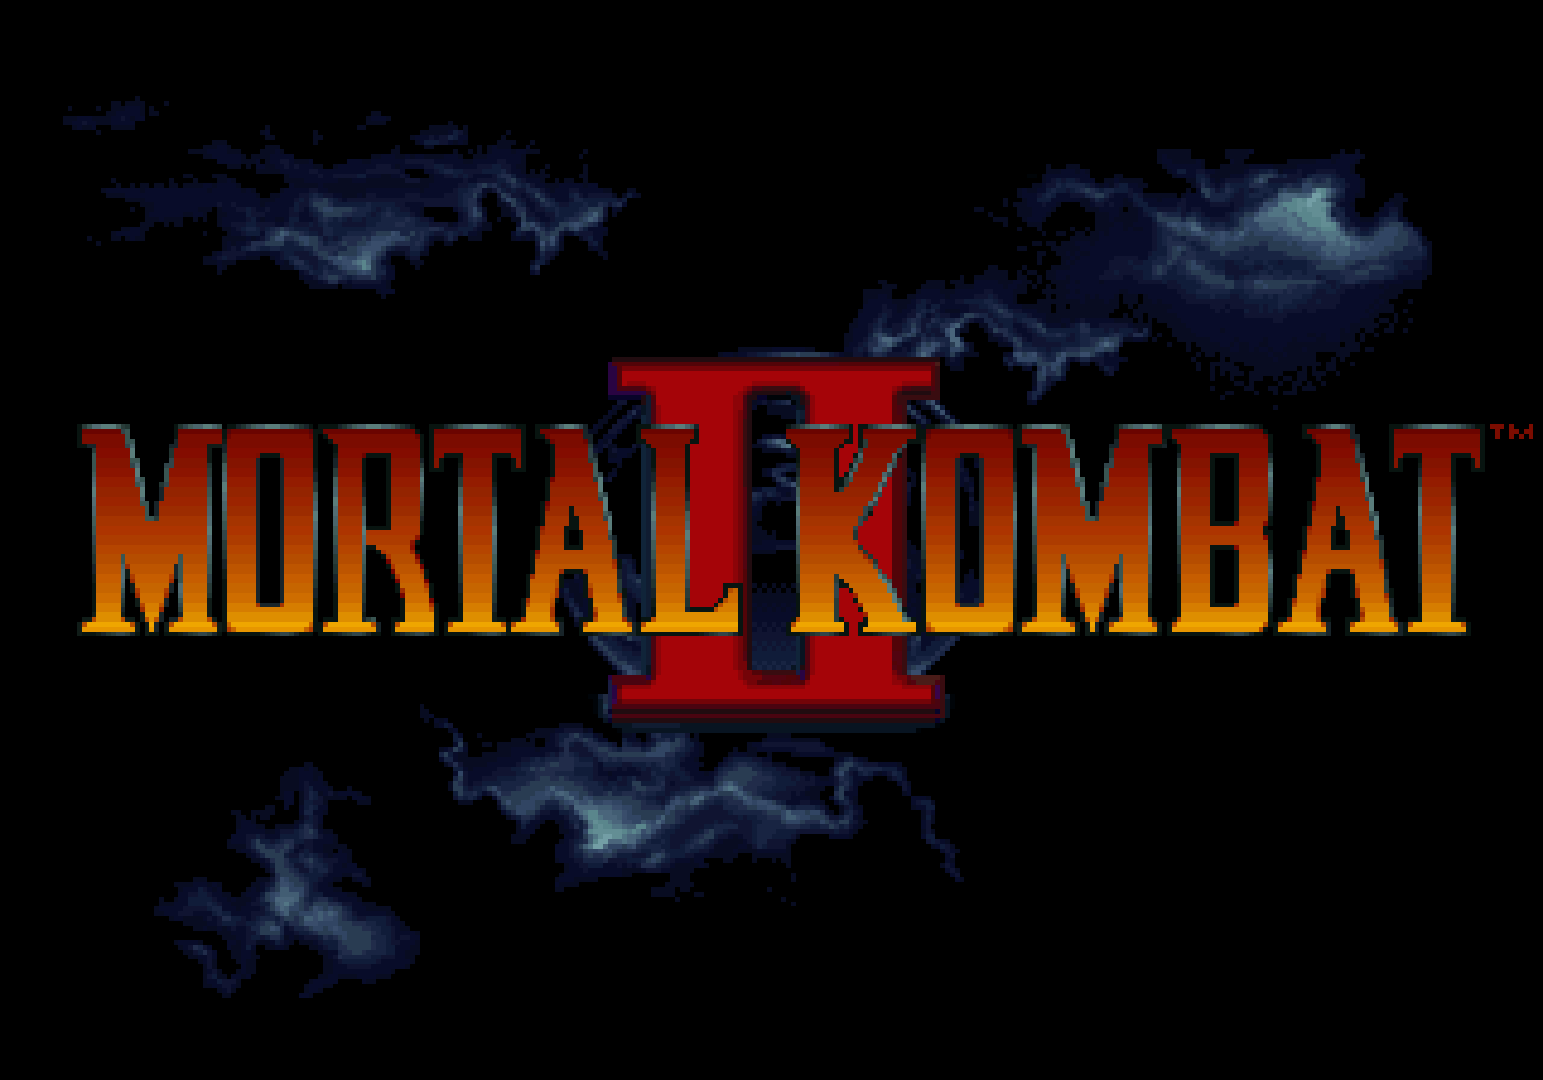 3d Wallpaper App Download Mortal Kombat Ii Details Launchbox Games Database